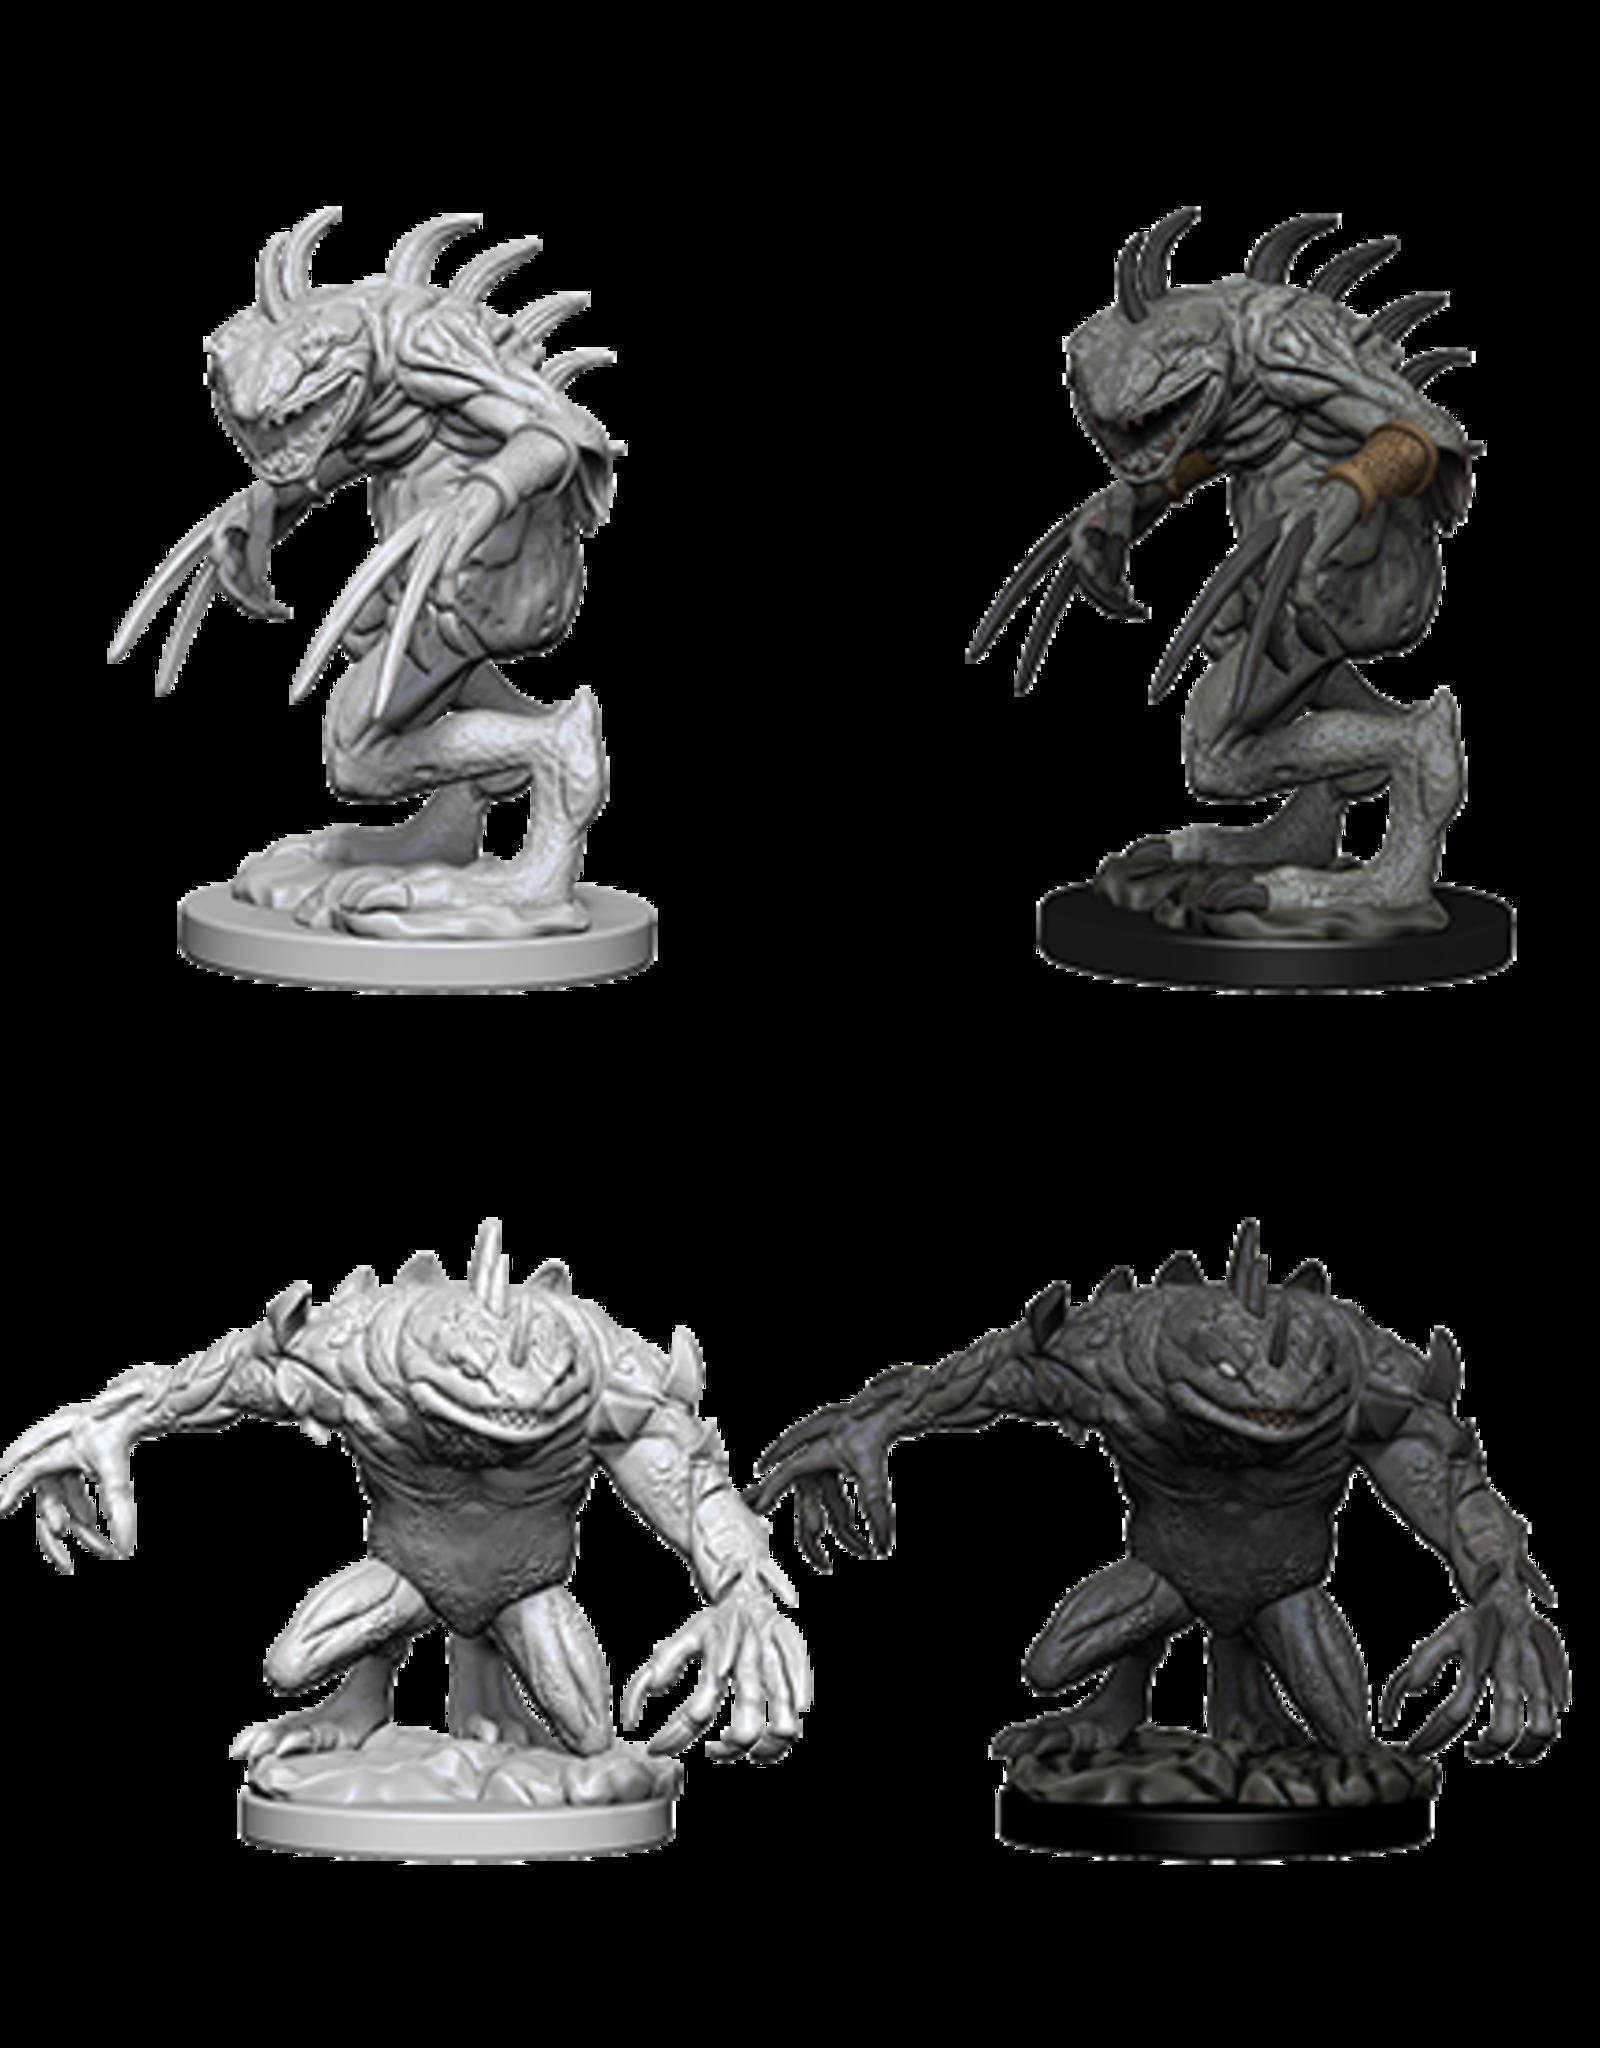 Dungeons & Dragons D&D NMU - Grey/Death Slaad (W5)